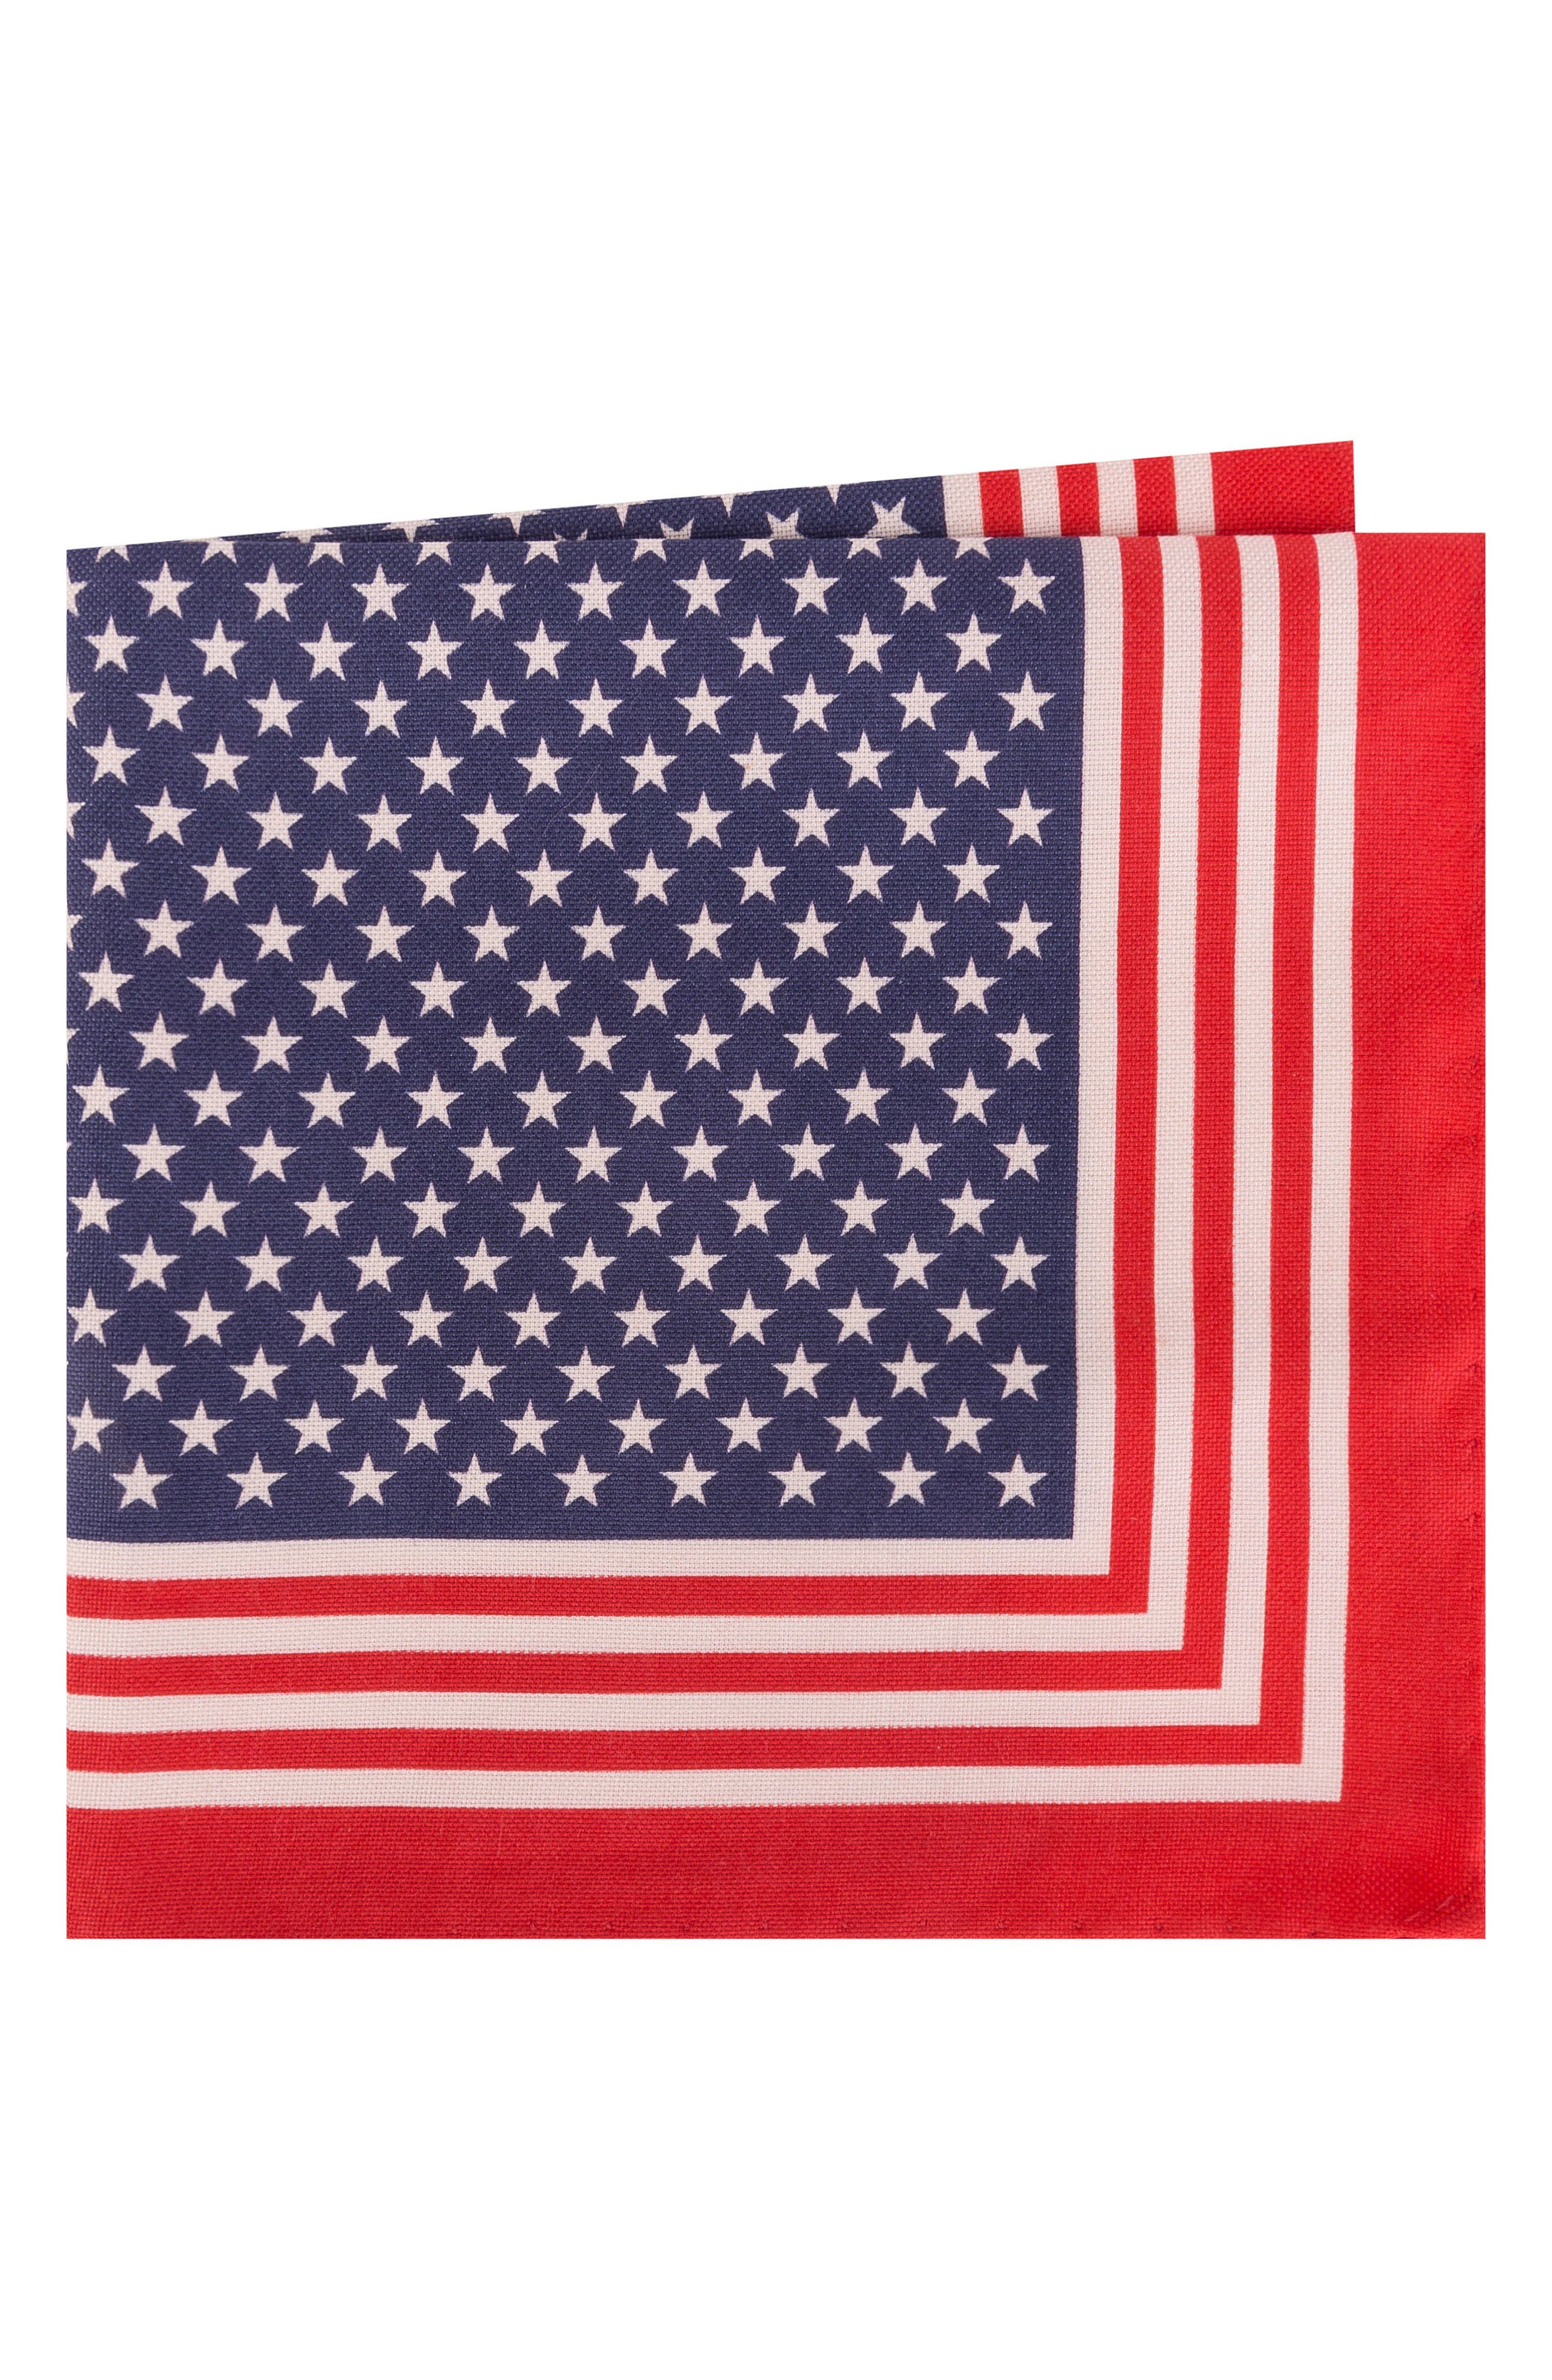 Ted Baker London Stars & Stripes Cotton & Silk Pocket Square